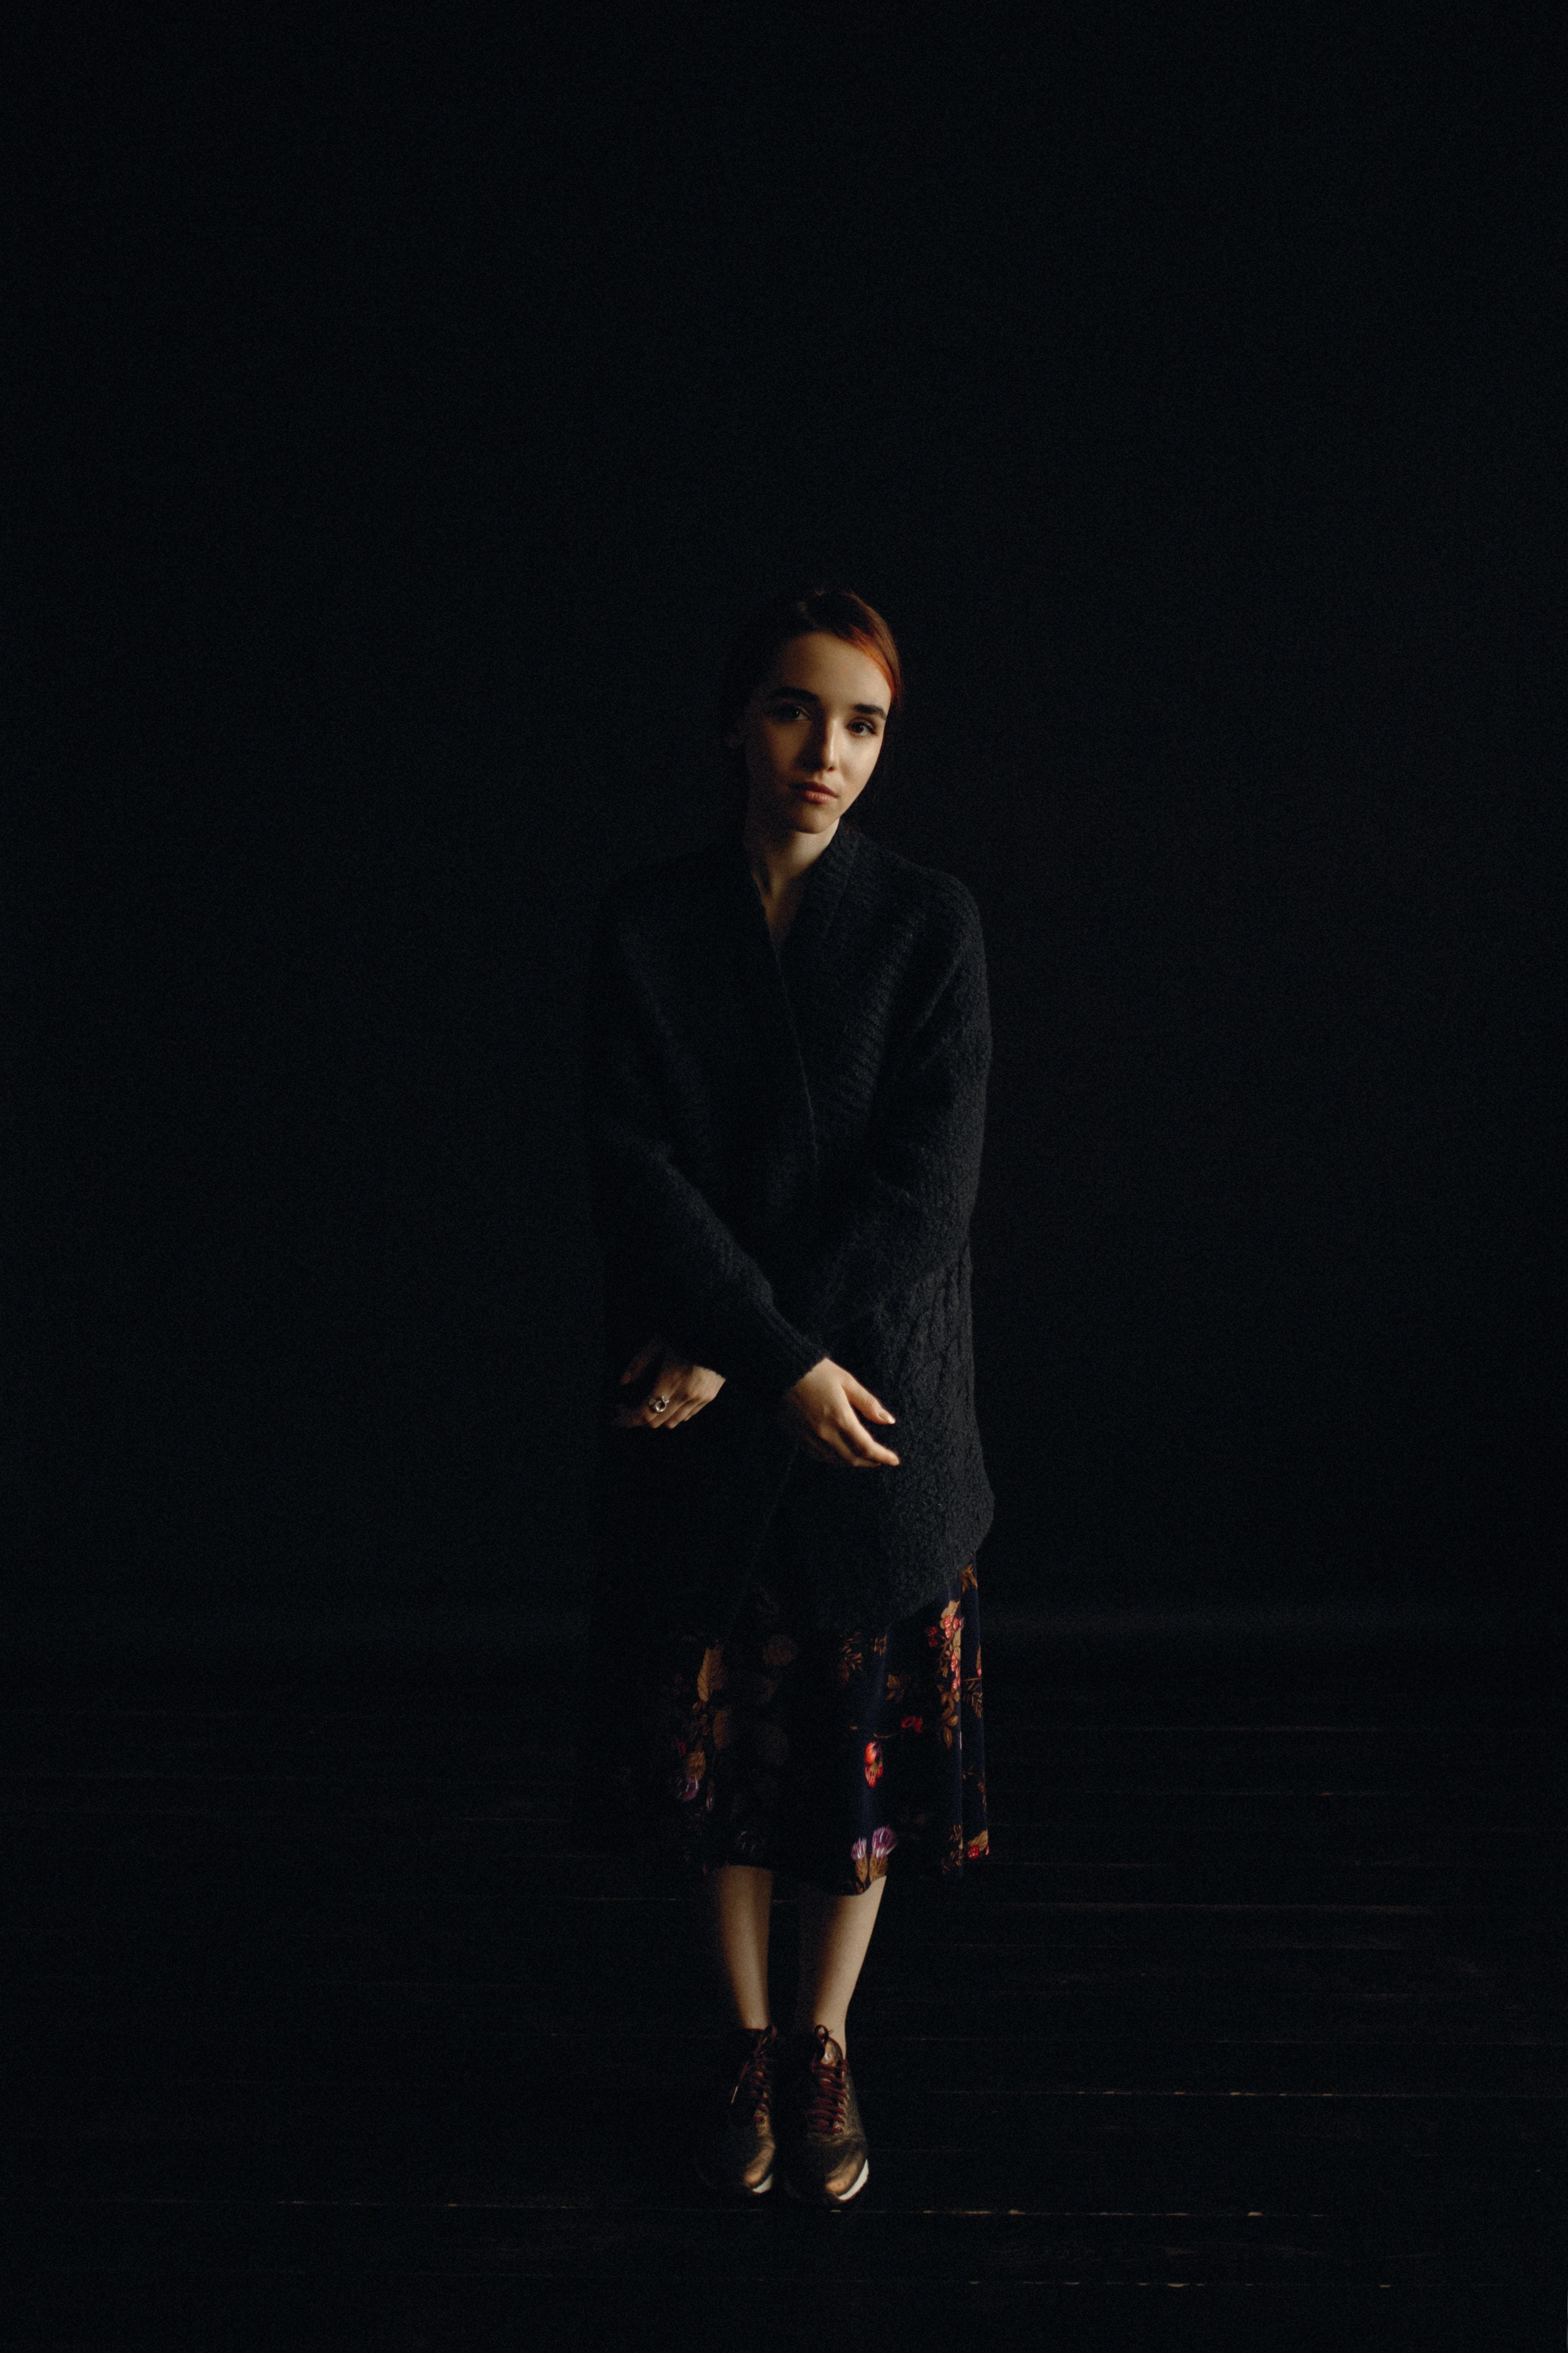 woman wearing black cardigan and skirt